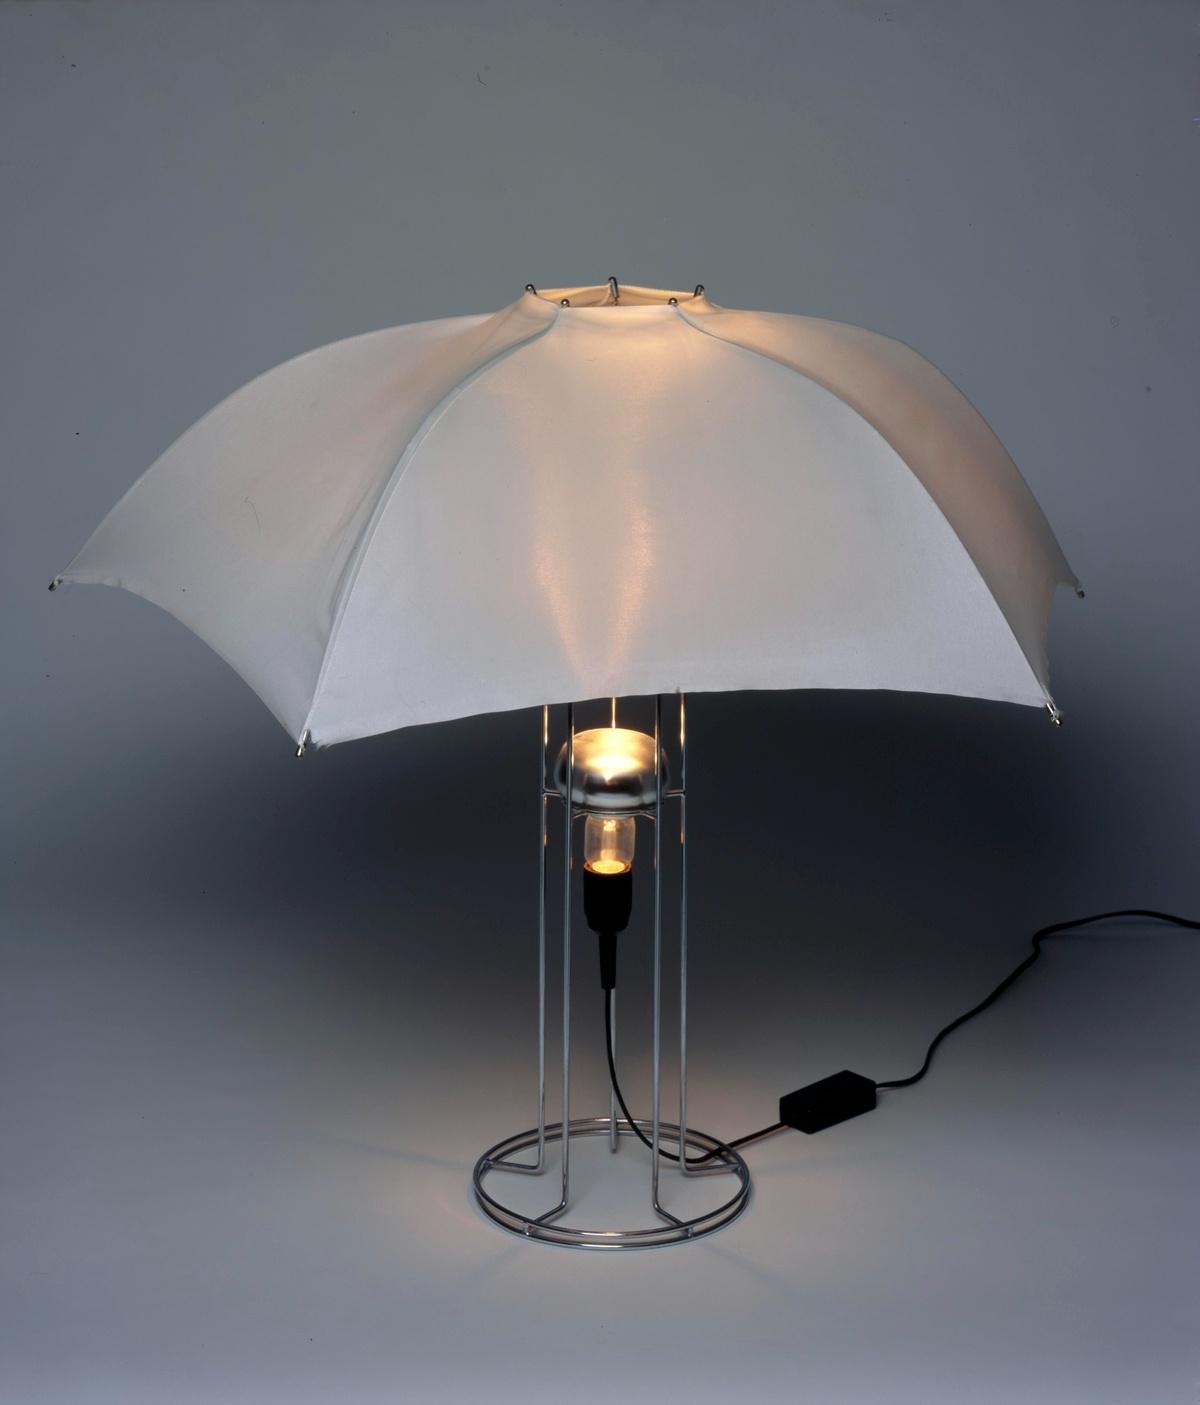 Umbrella Lamp (1973 - 1987) designed by Gijs Bakker (Centraal Museum, Utrecht)